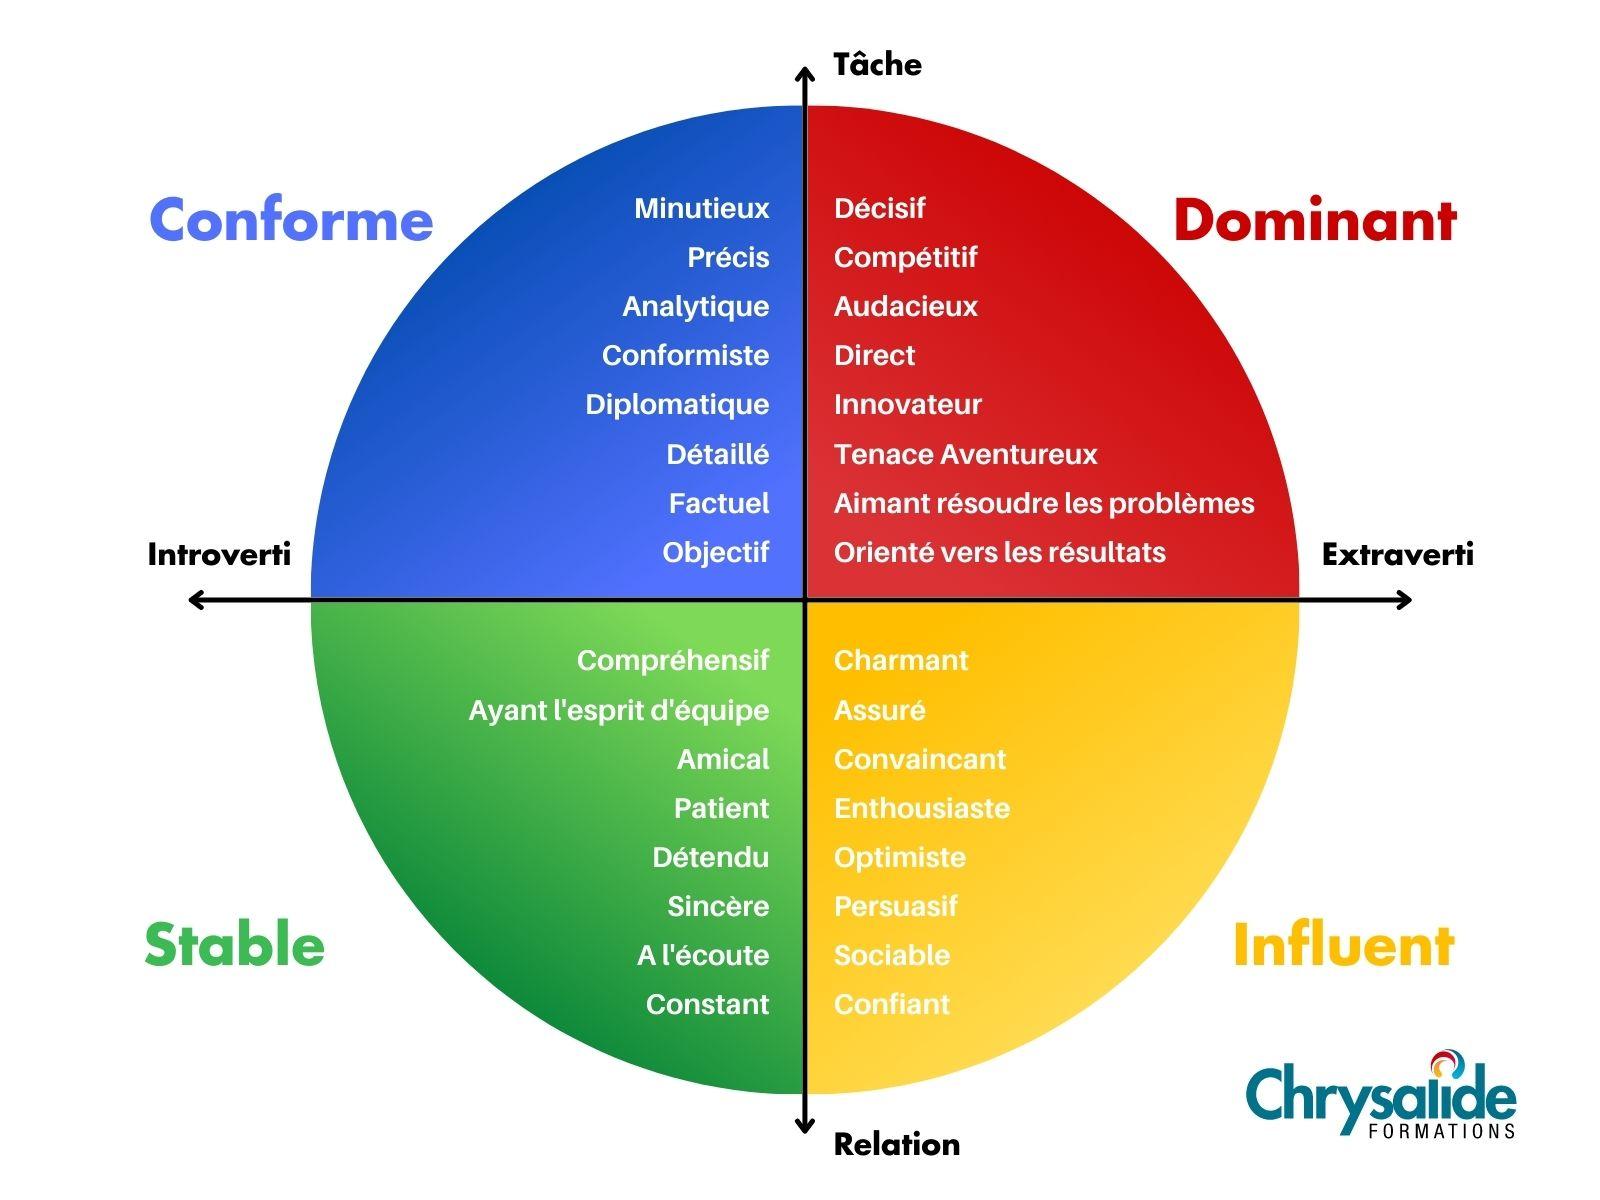 les_couleurs_disc_chrysalide_formation